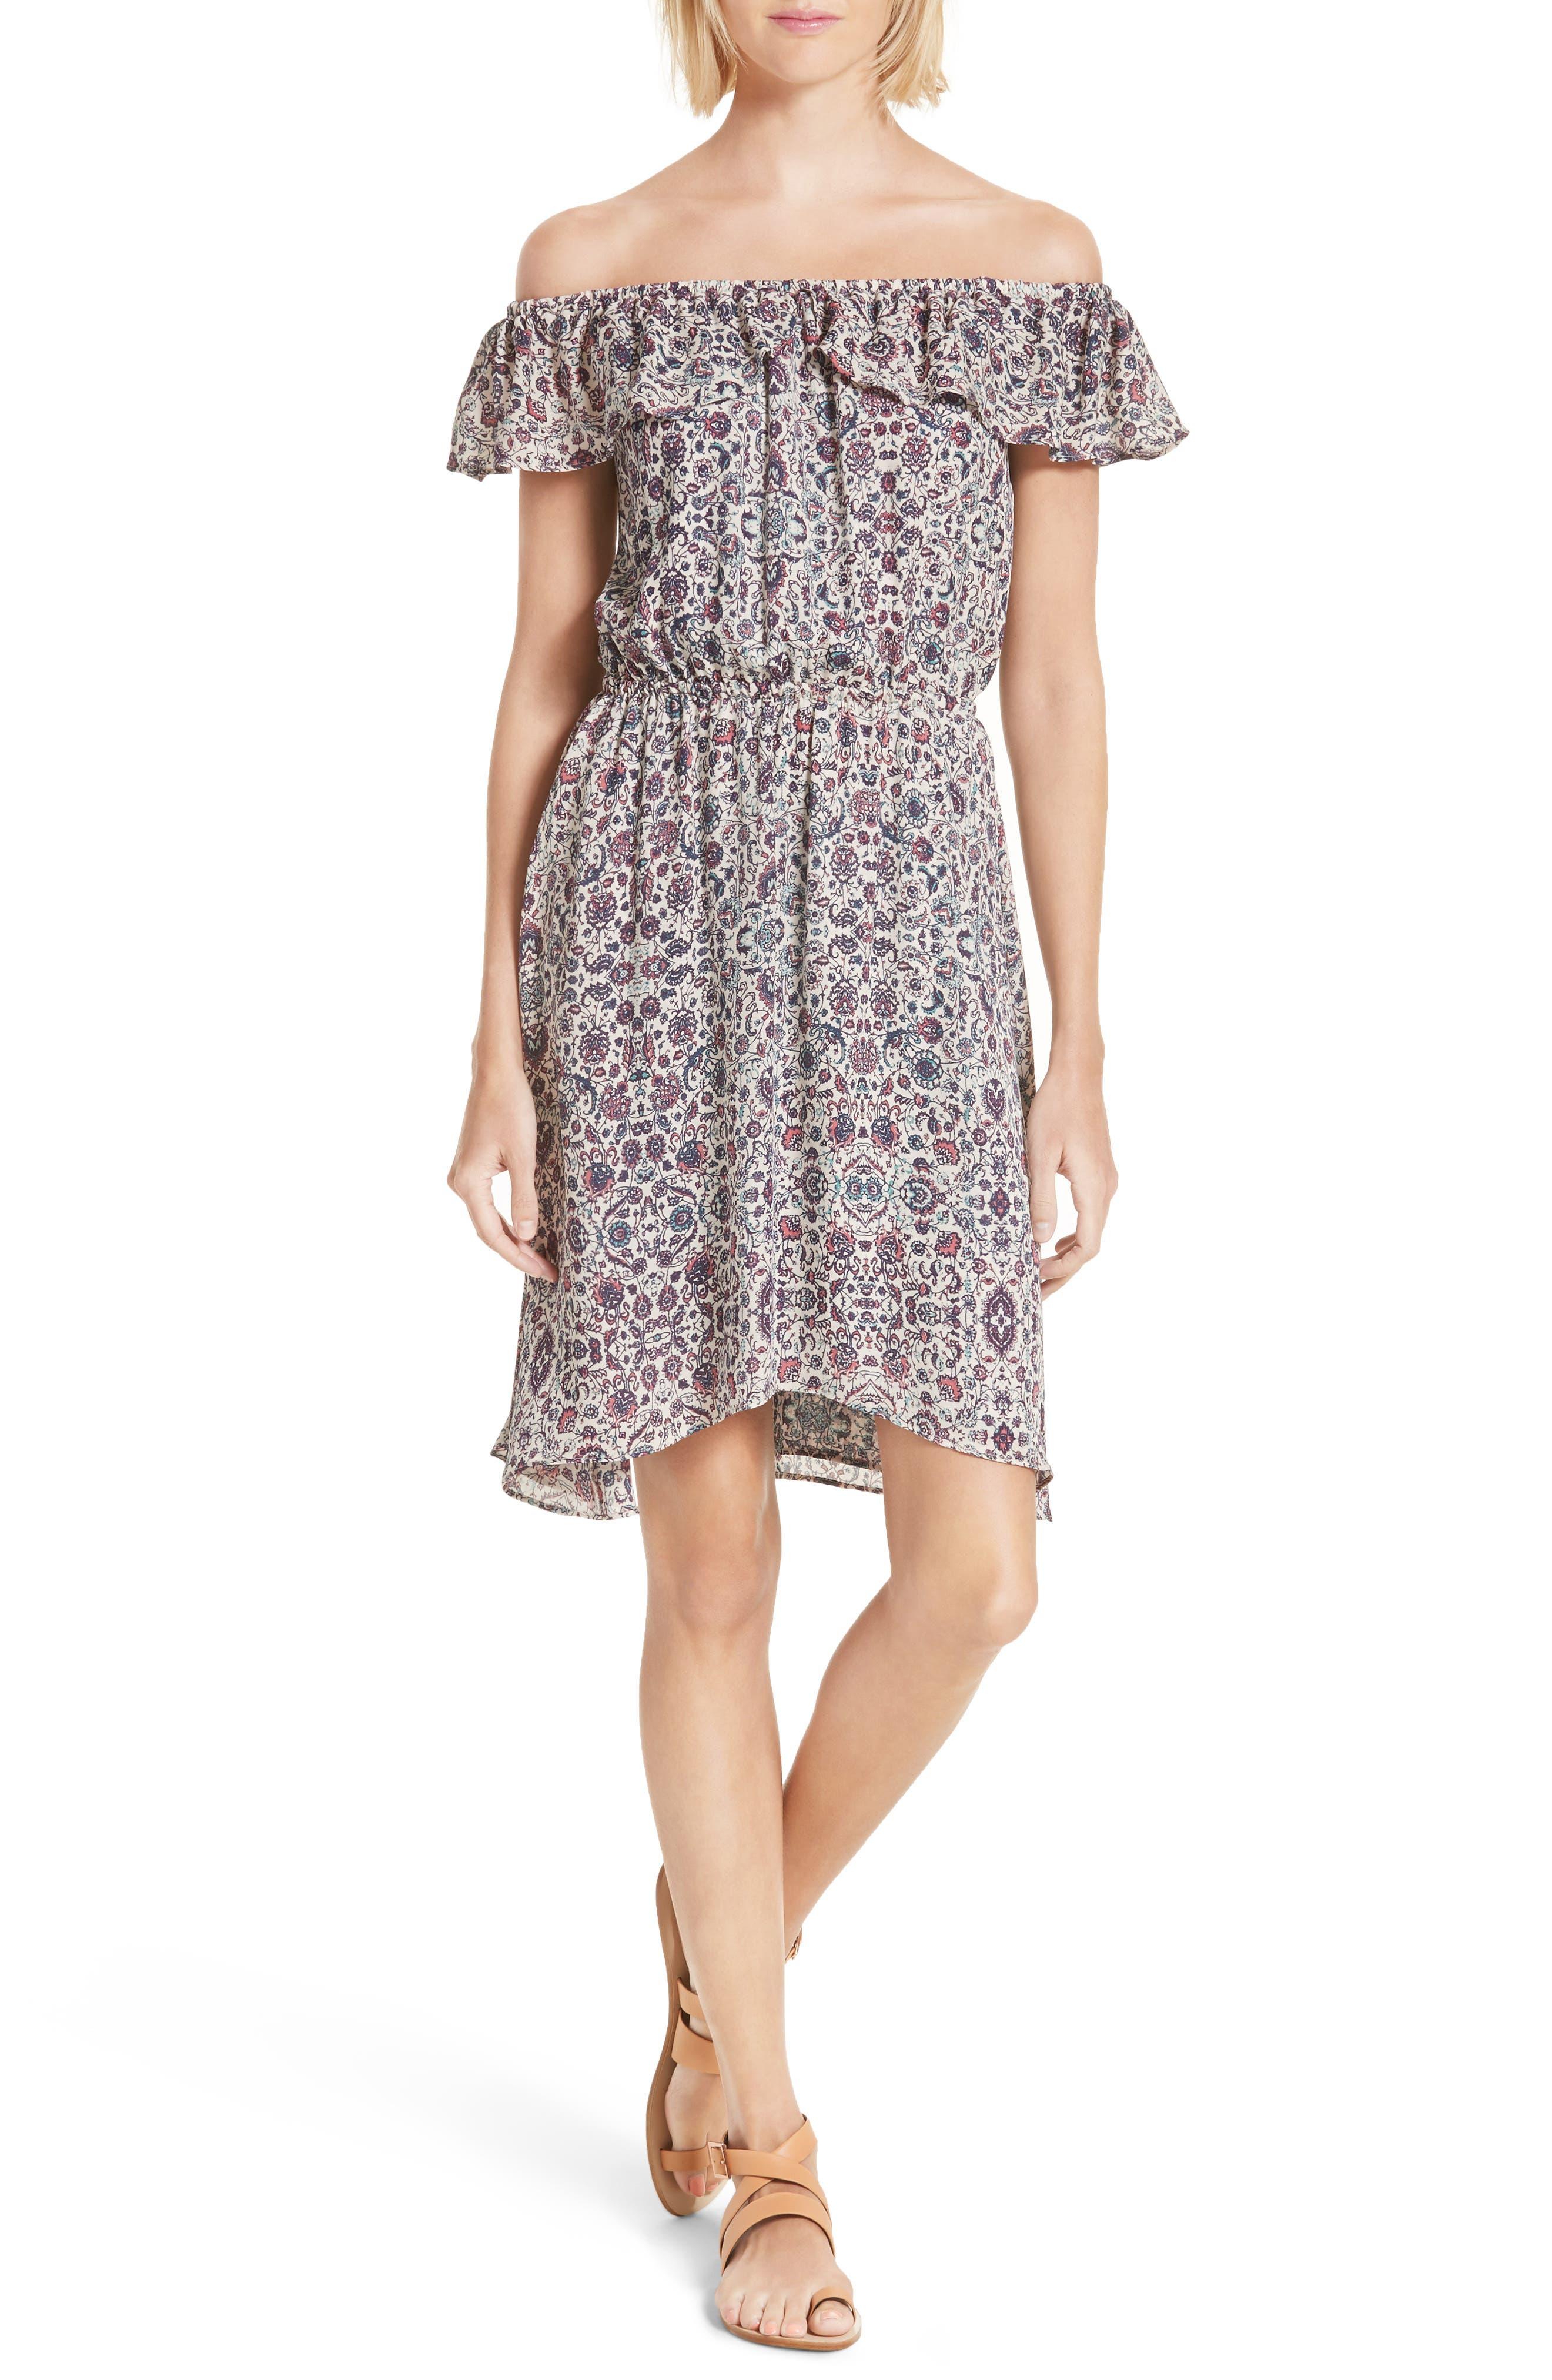 LAGENCE Leonie Print Off the Shoulder Dress